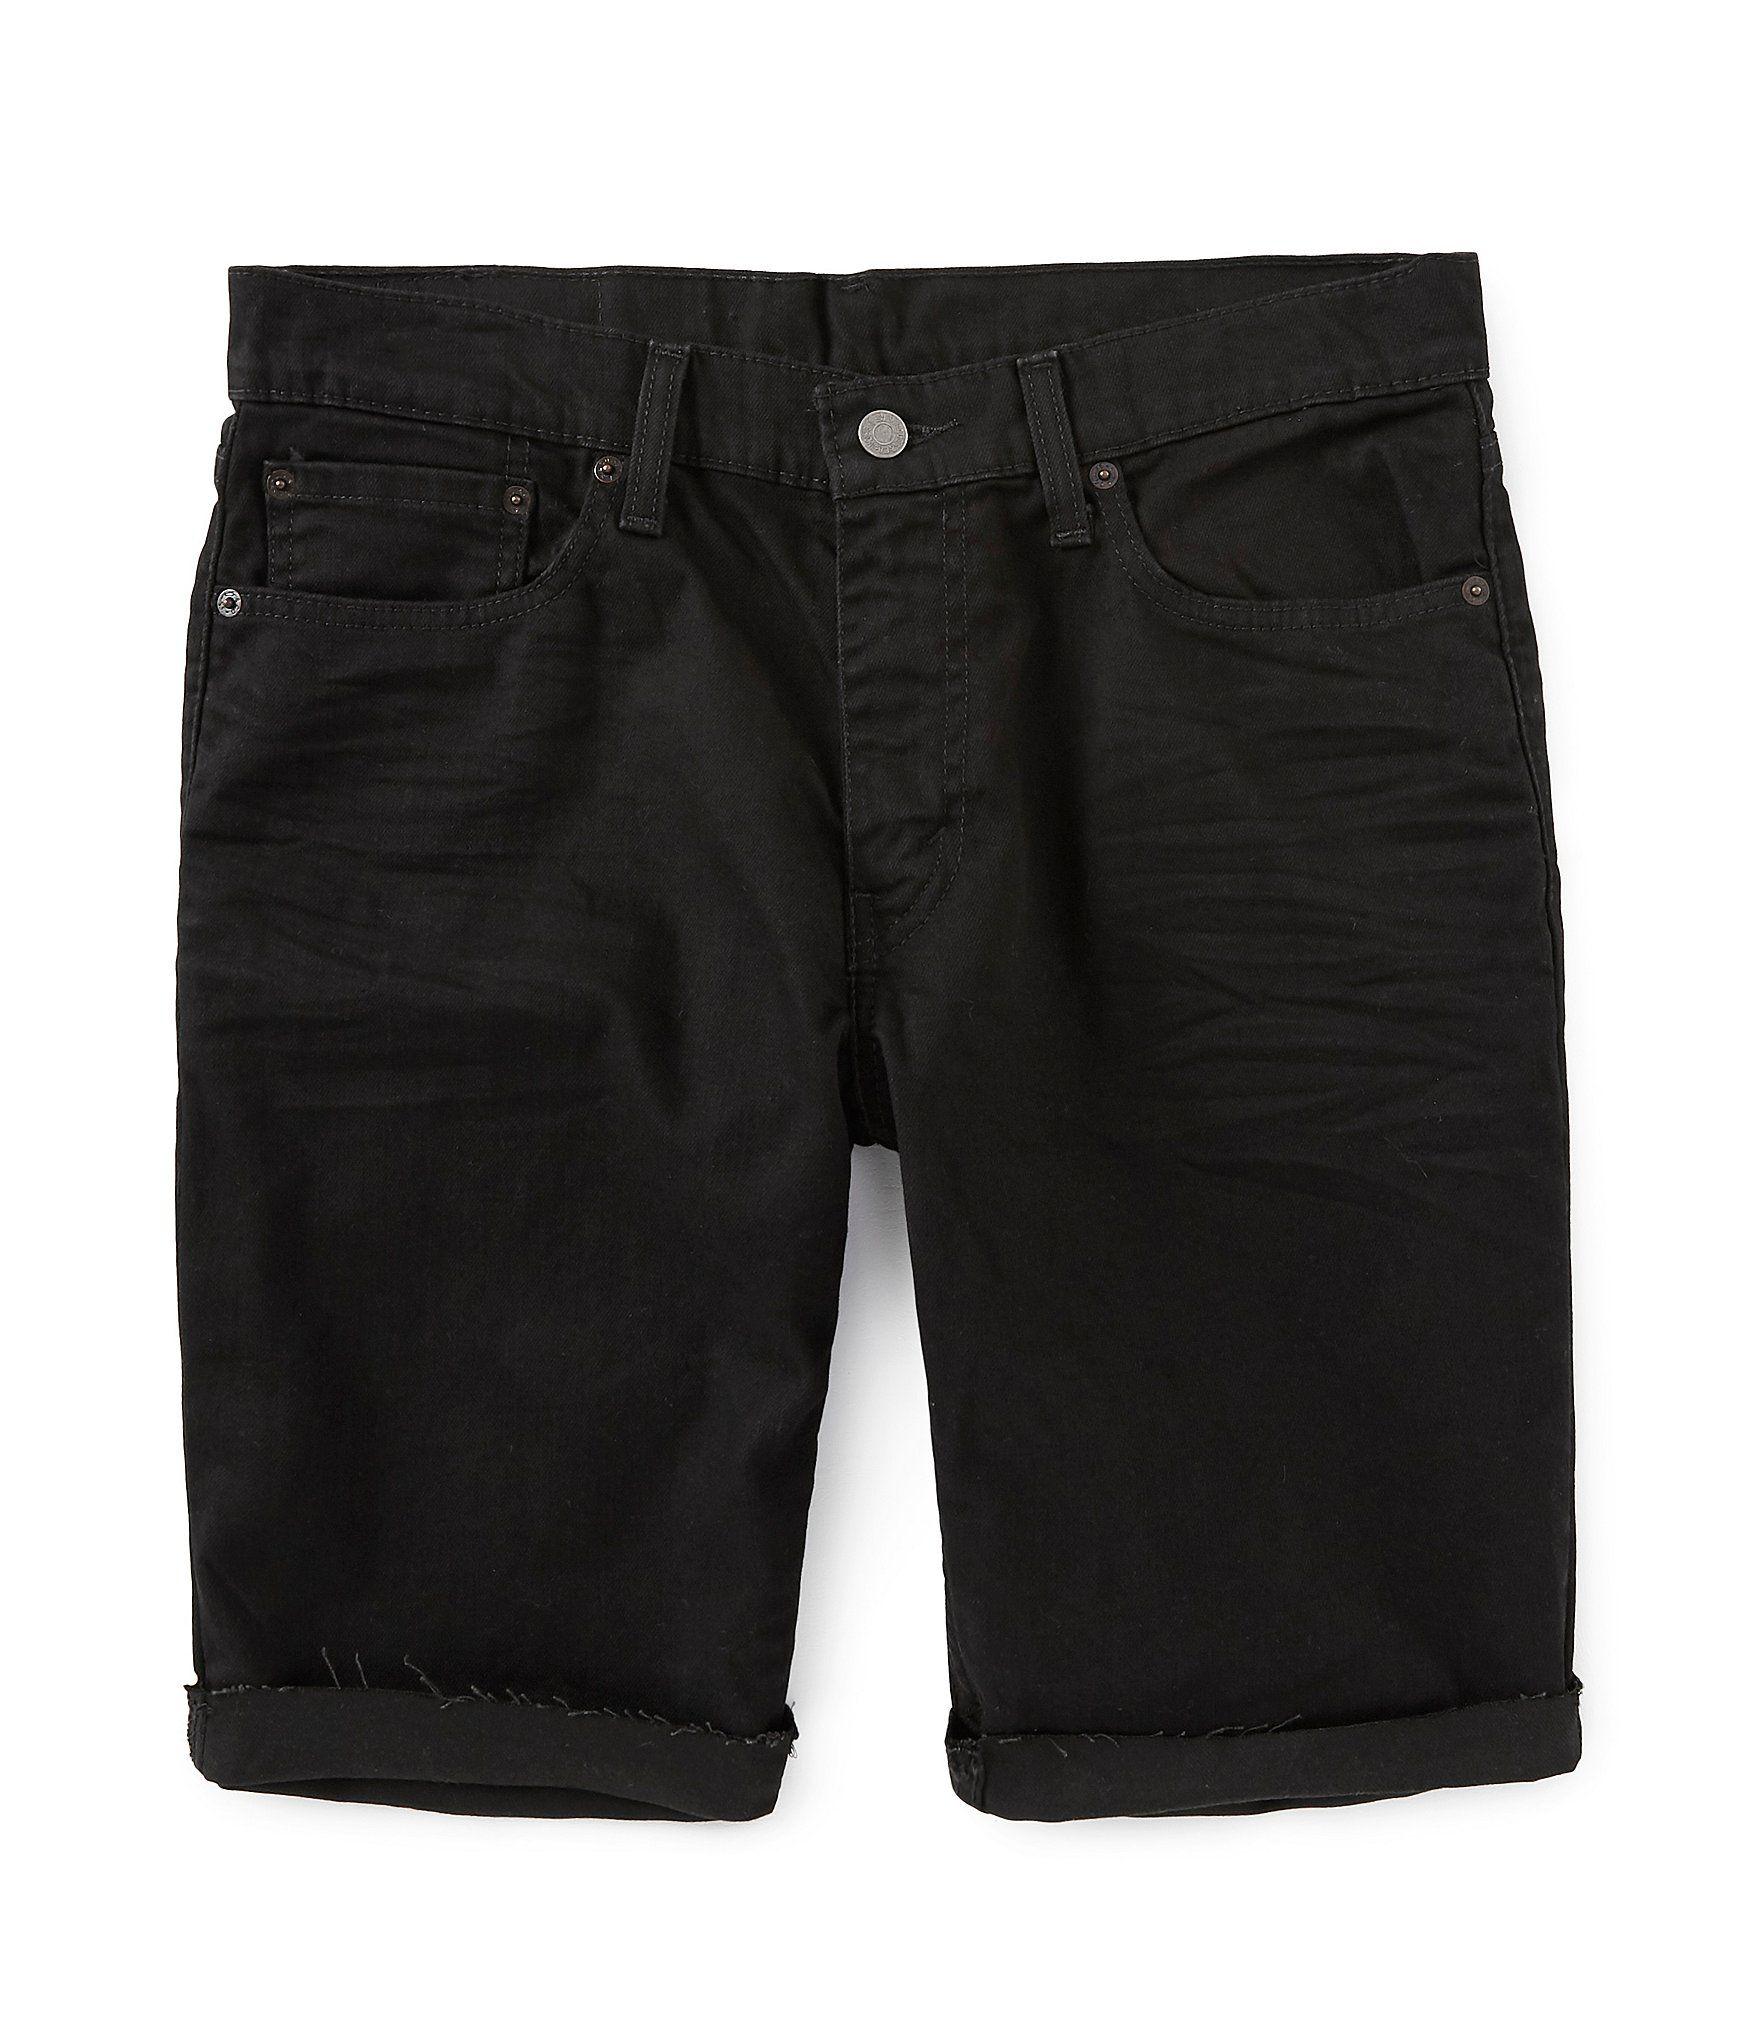 Levi's® 511 Slim Fit 12 Inseam Cut Off Jean Shorts – Black 31